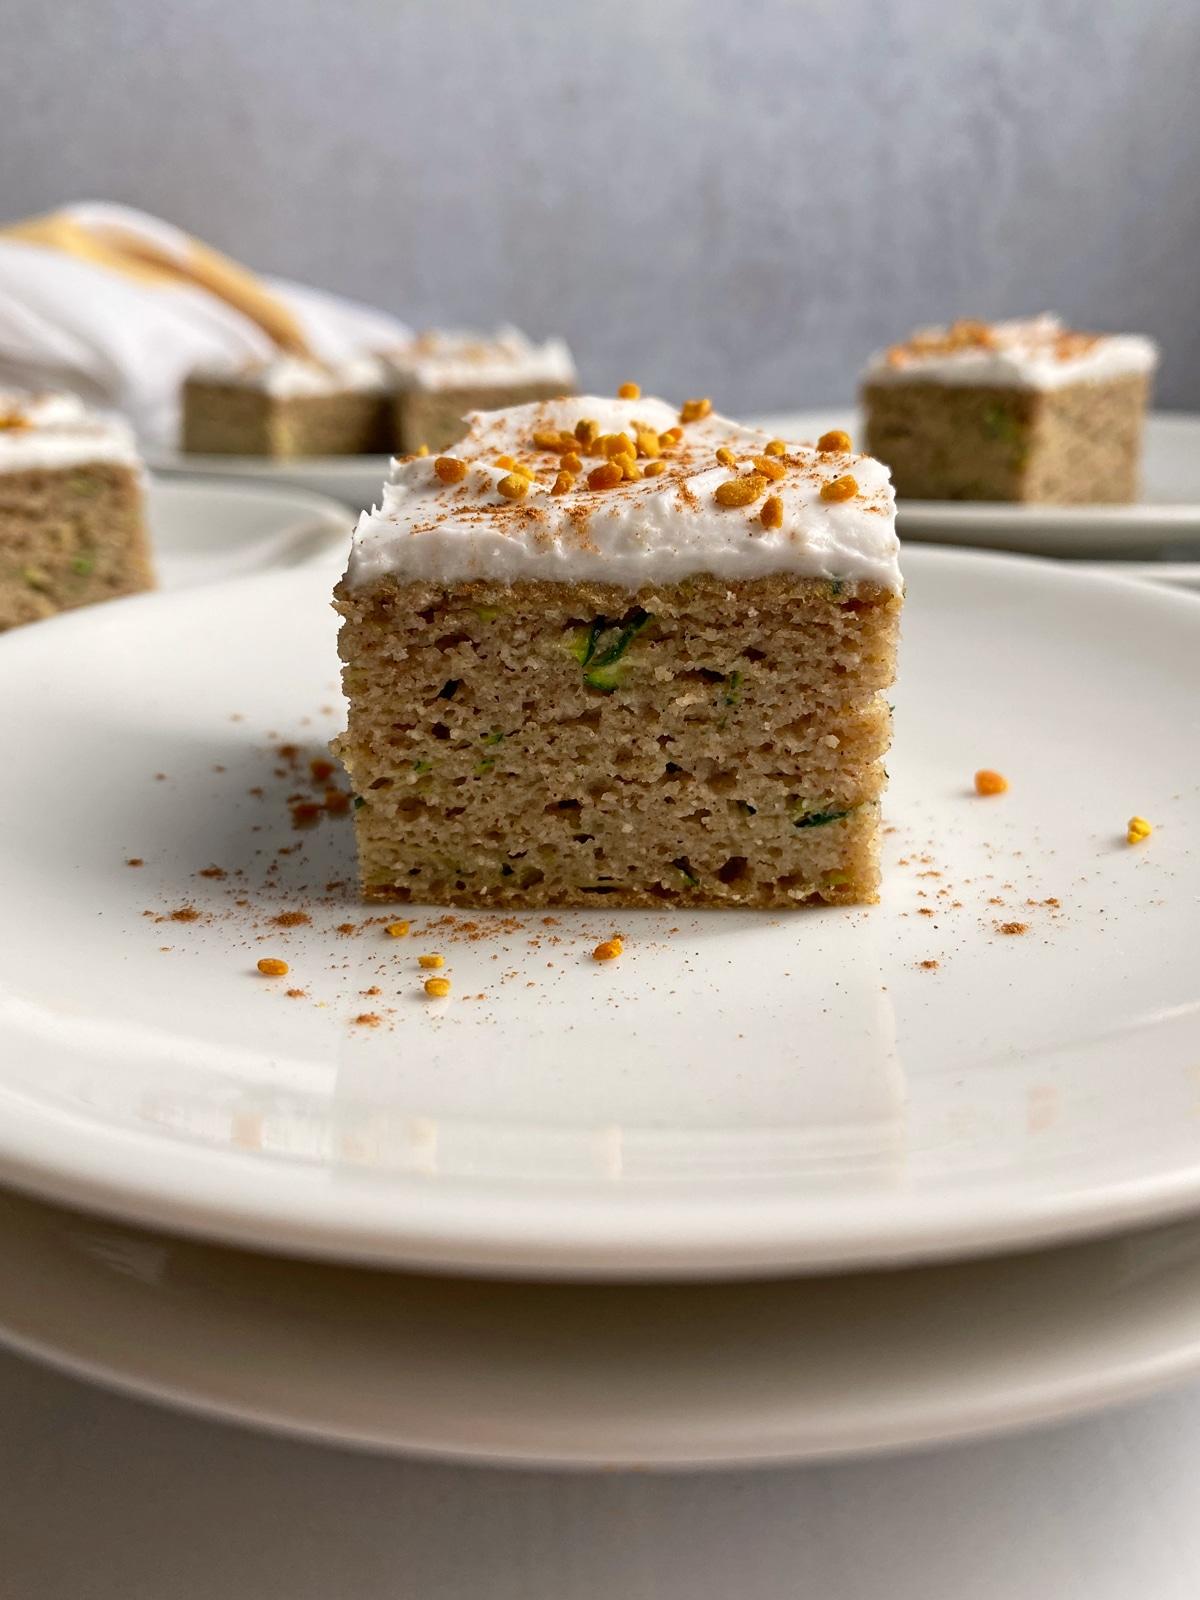 slice of zucchini breakfast cake from side